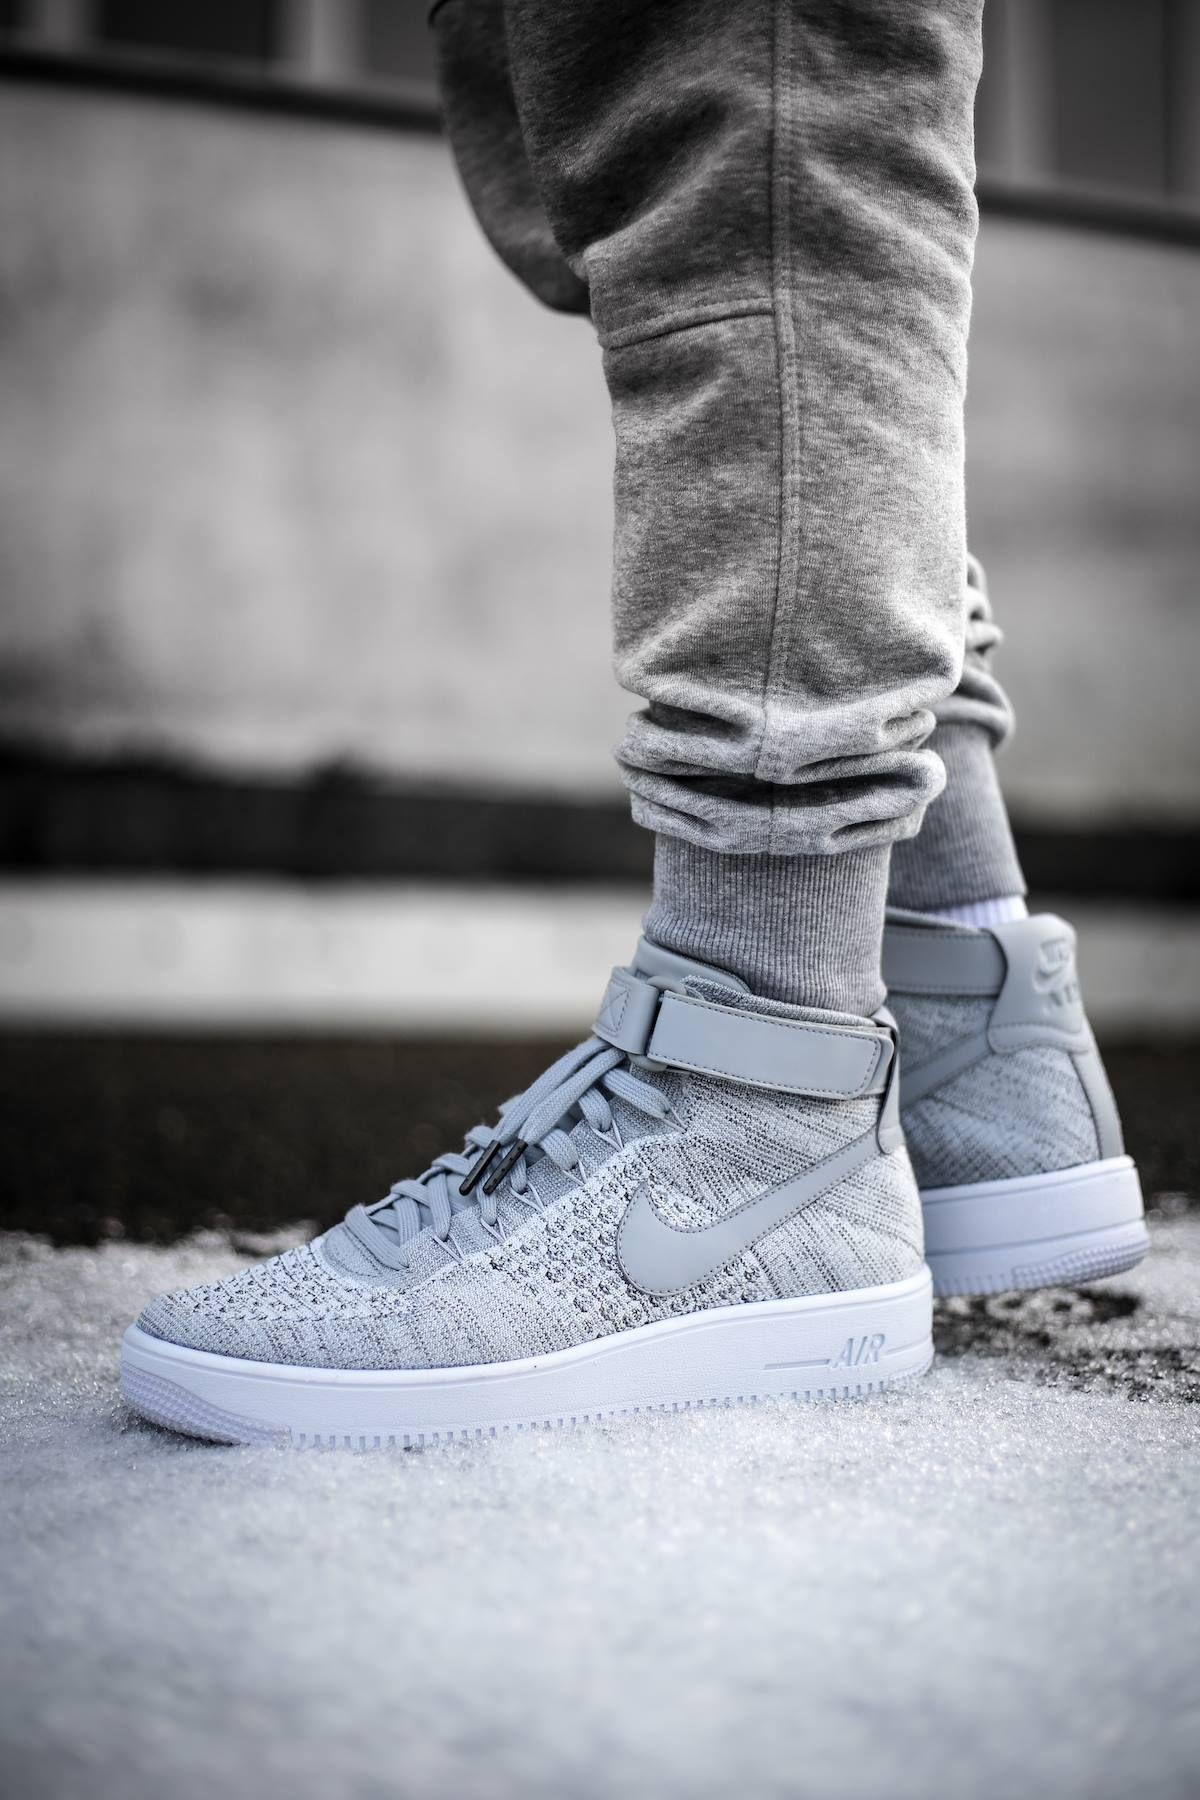 Nike Air Force 1 Mid Flyknit 'Grey' (via Kicks